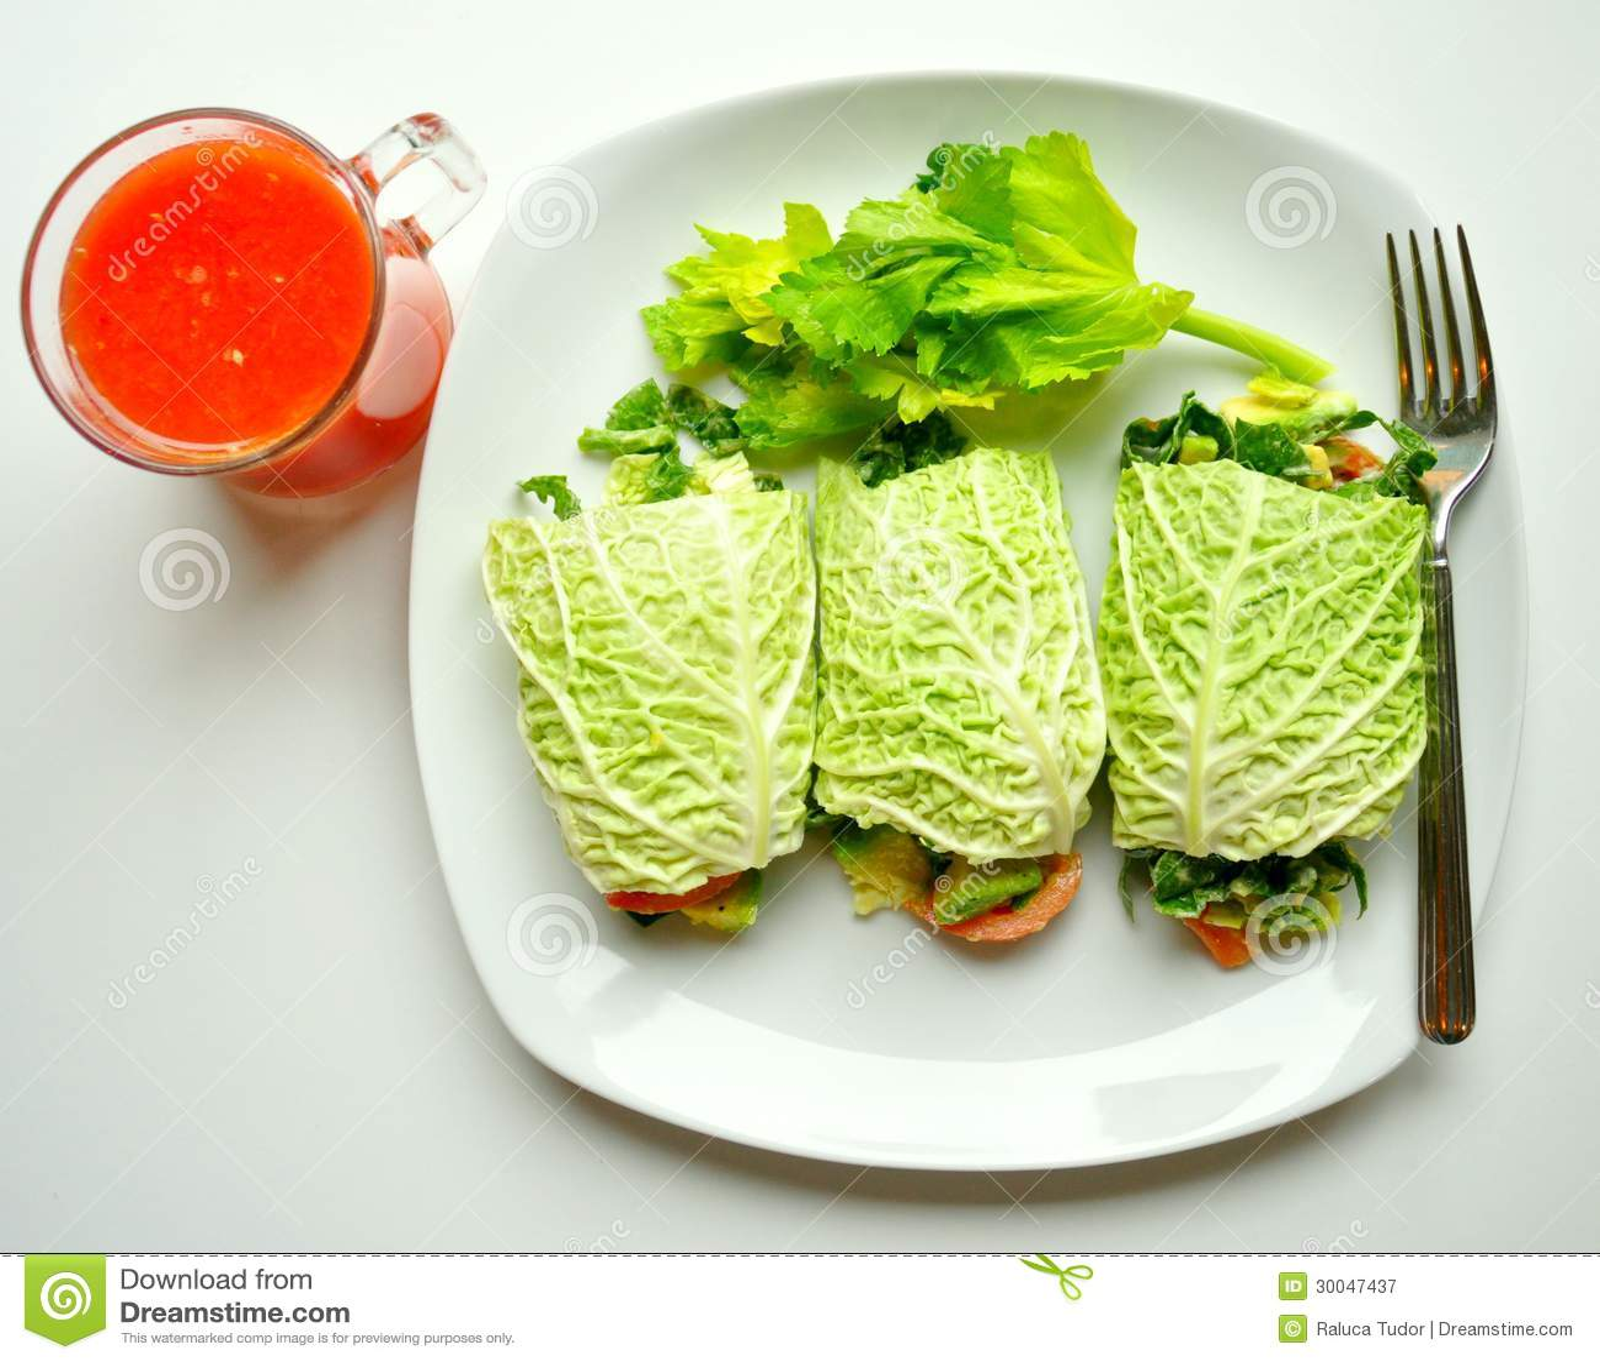 Detox diet with raw vegan rolls and red orange juice